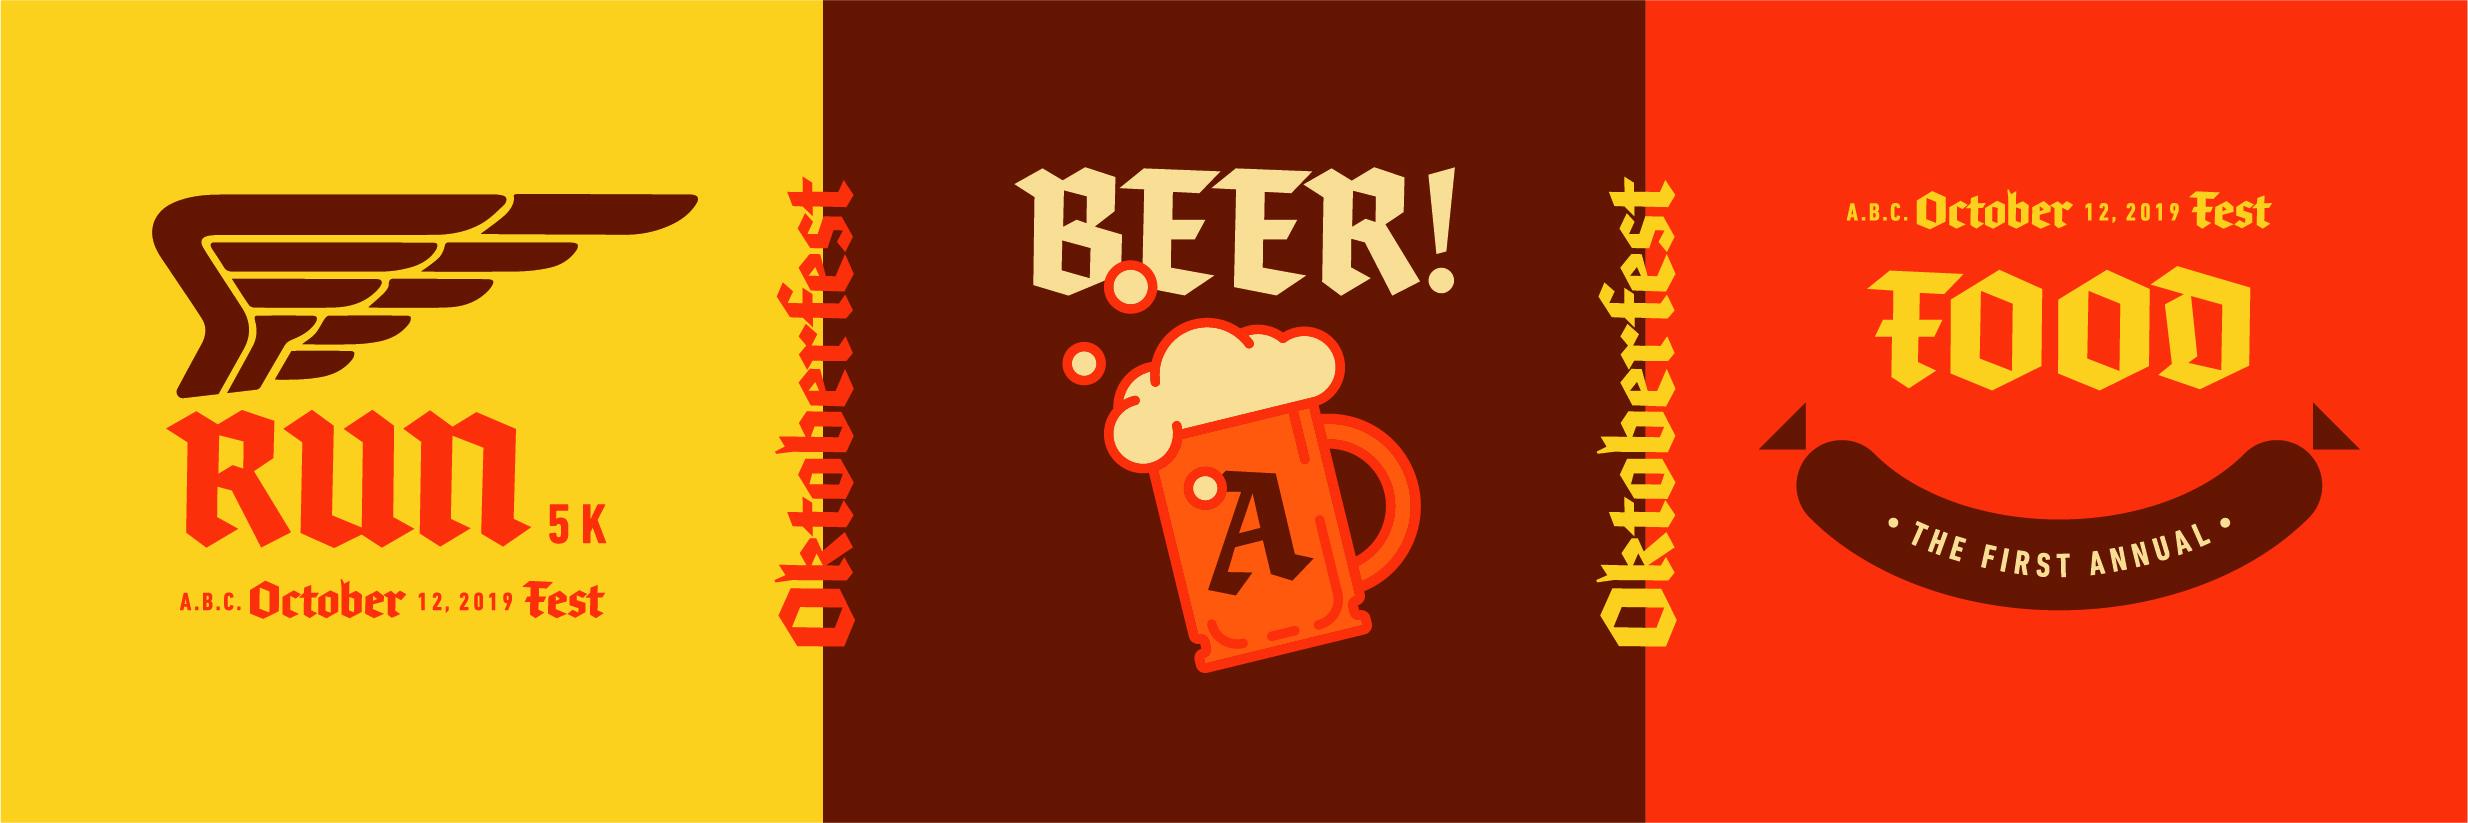 ABC_Octoberfest_Graphic-06.jpg